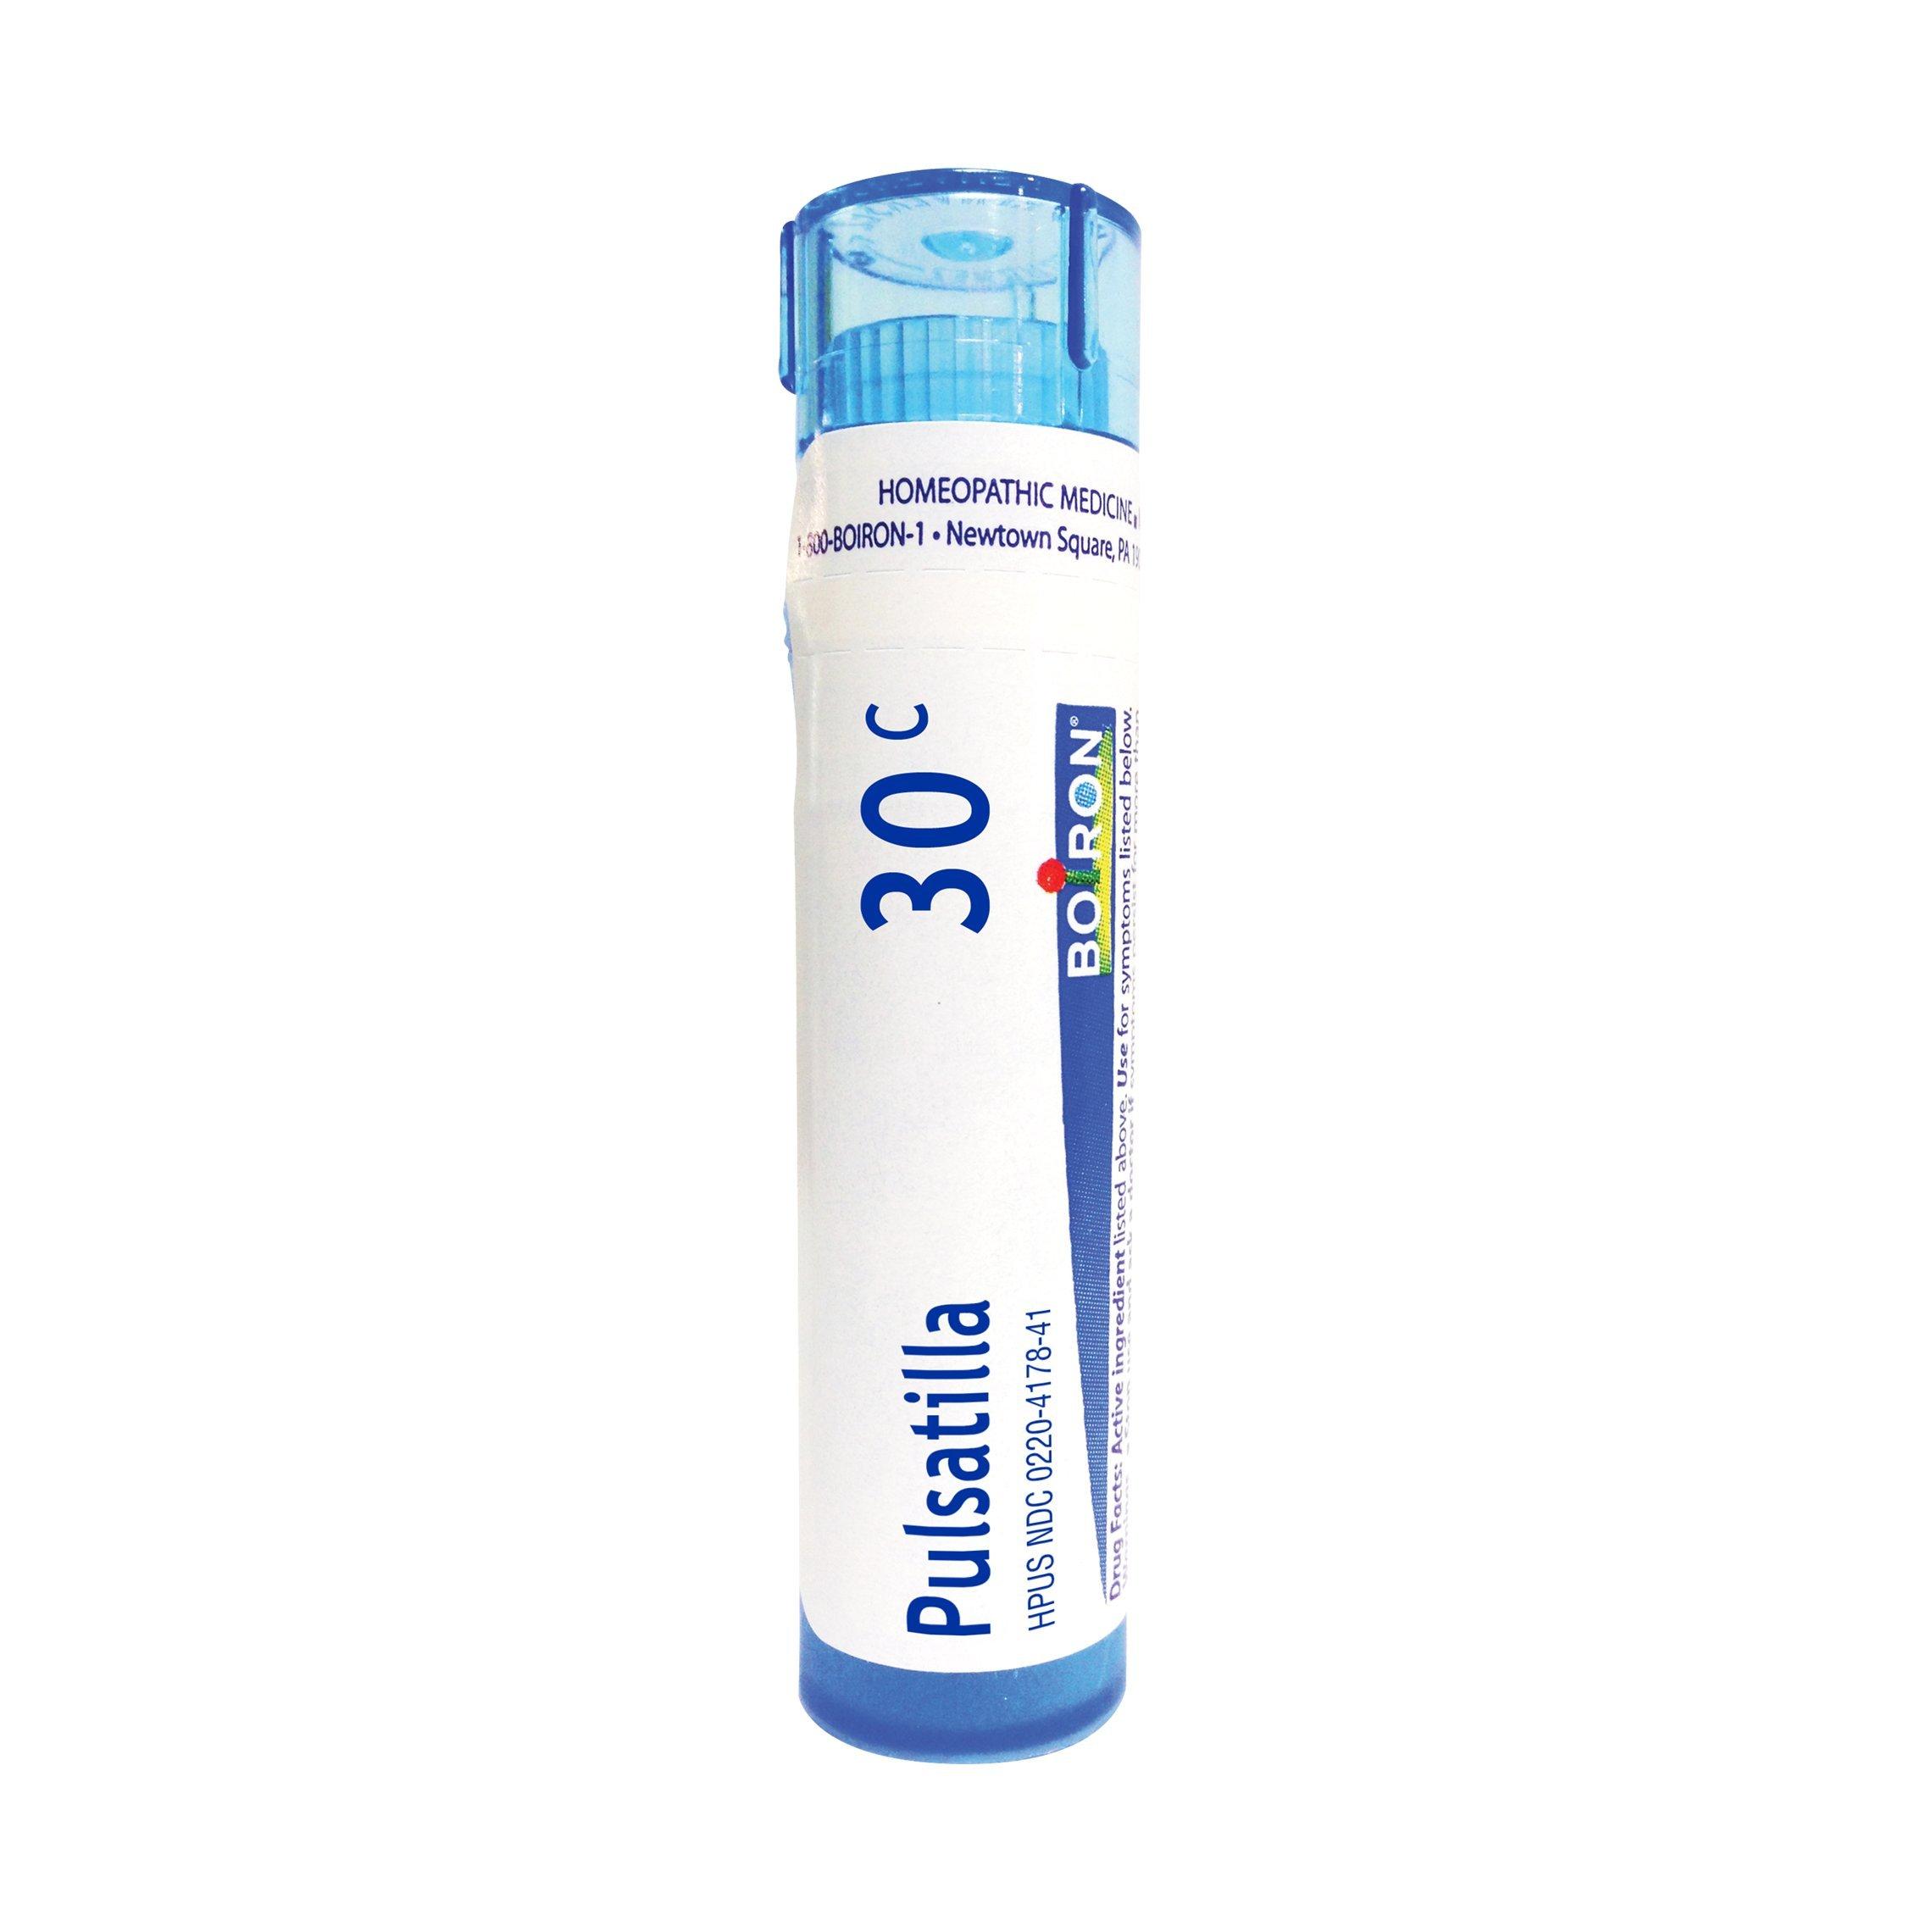 Boiron Pulsatilla 30C, 80 Pellets, Homeopathic Medicine for Colds